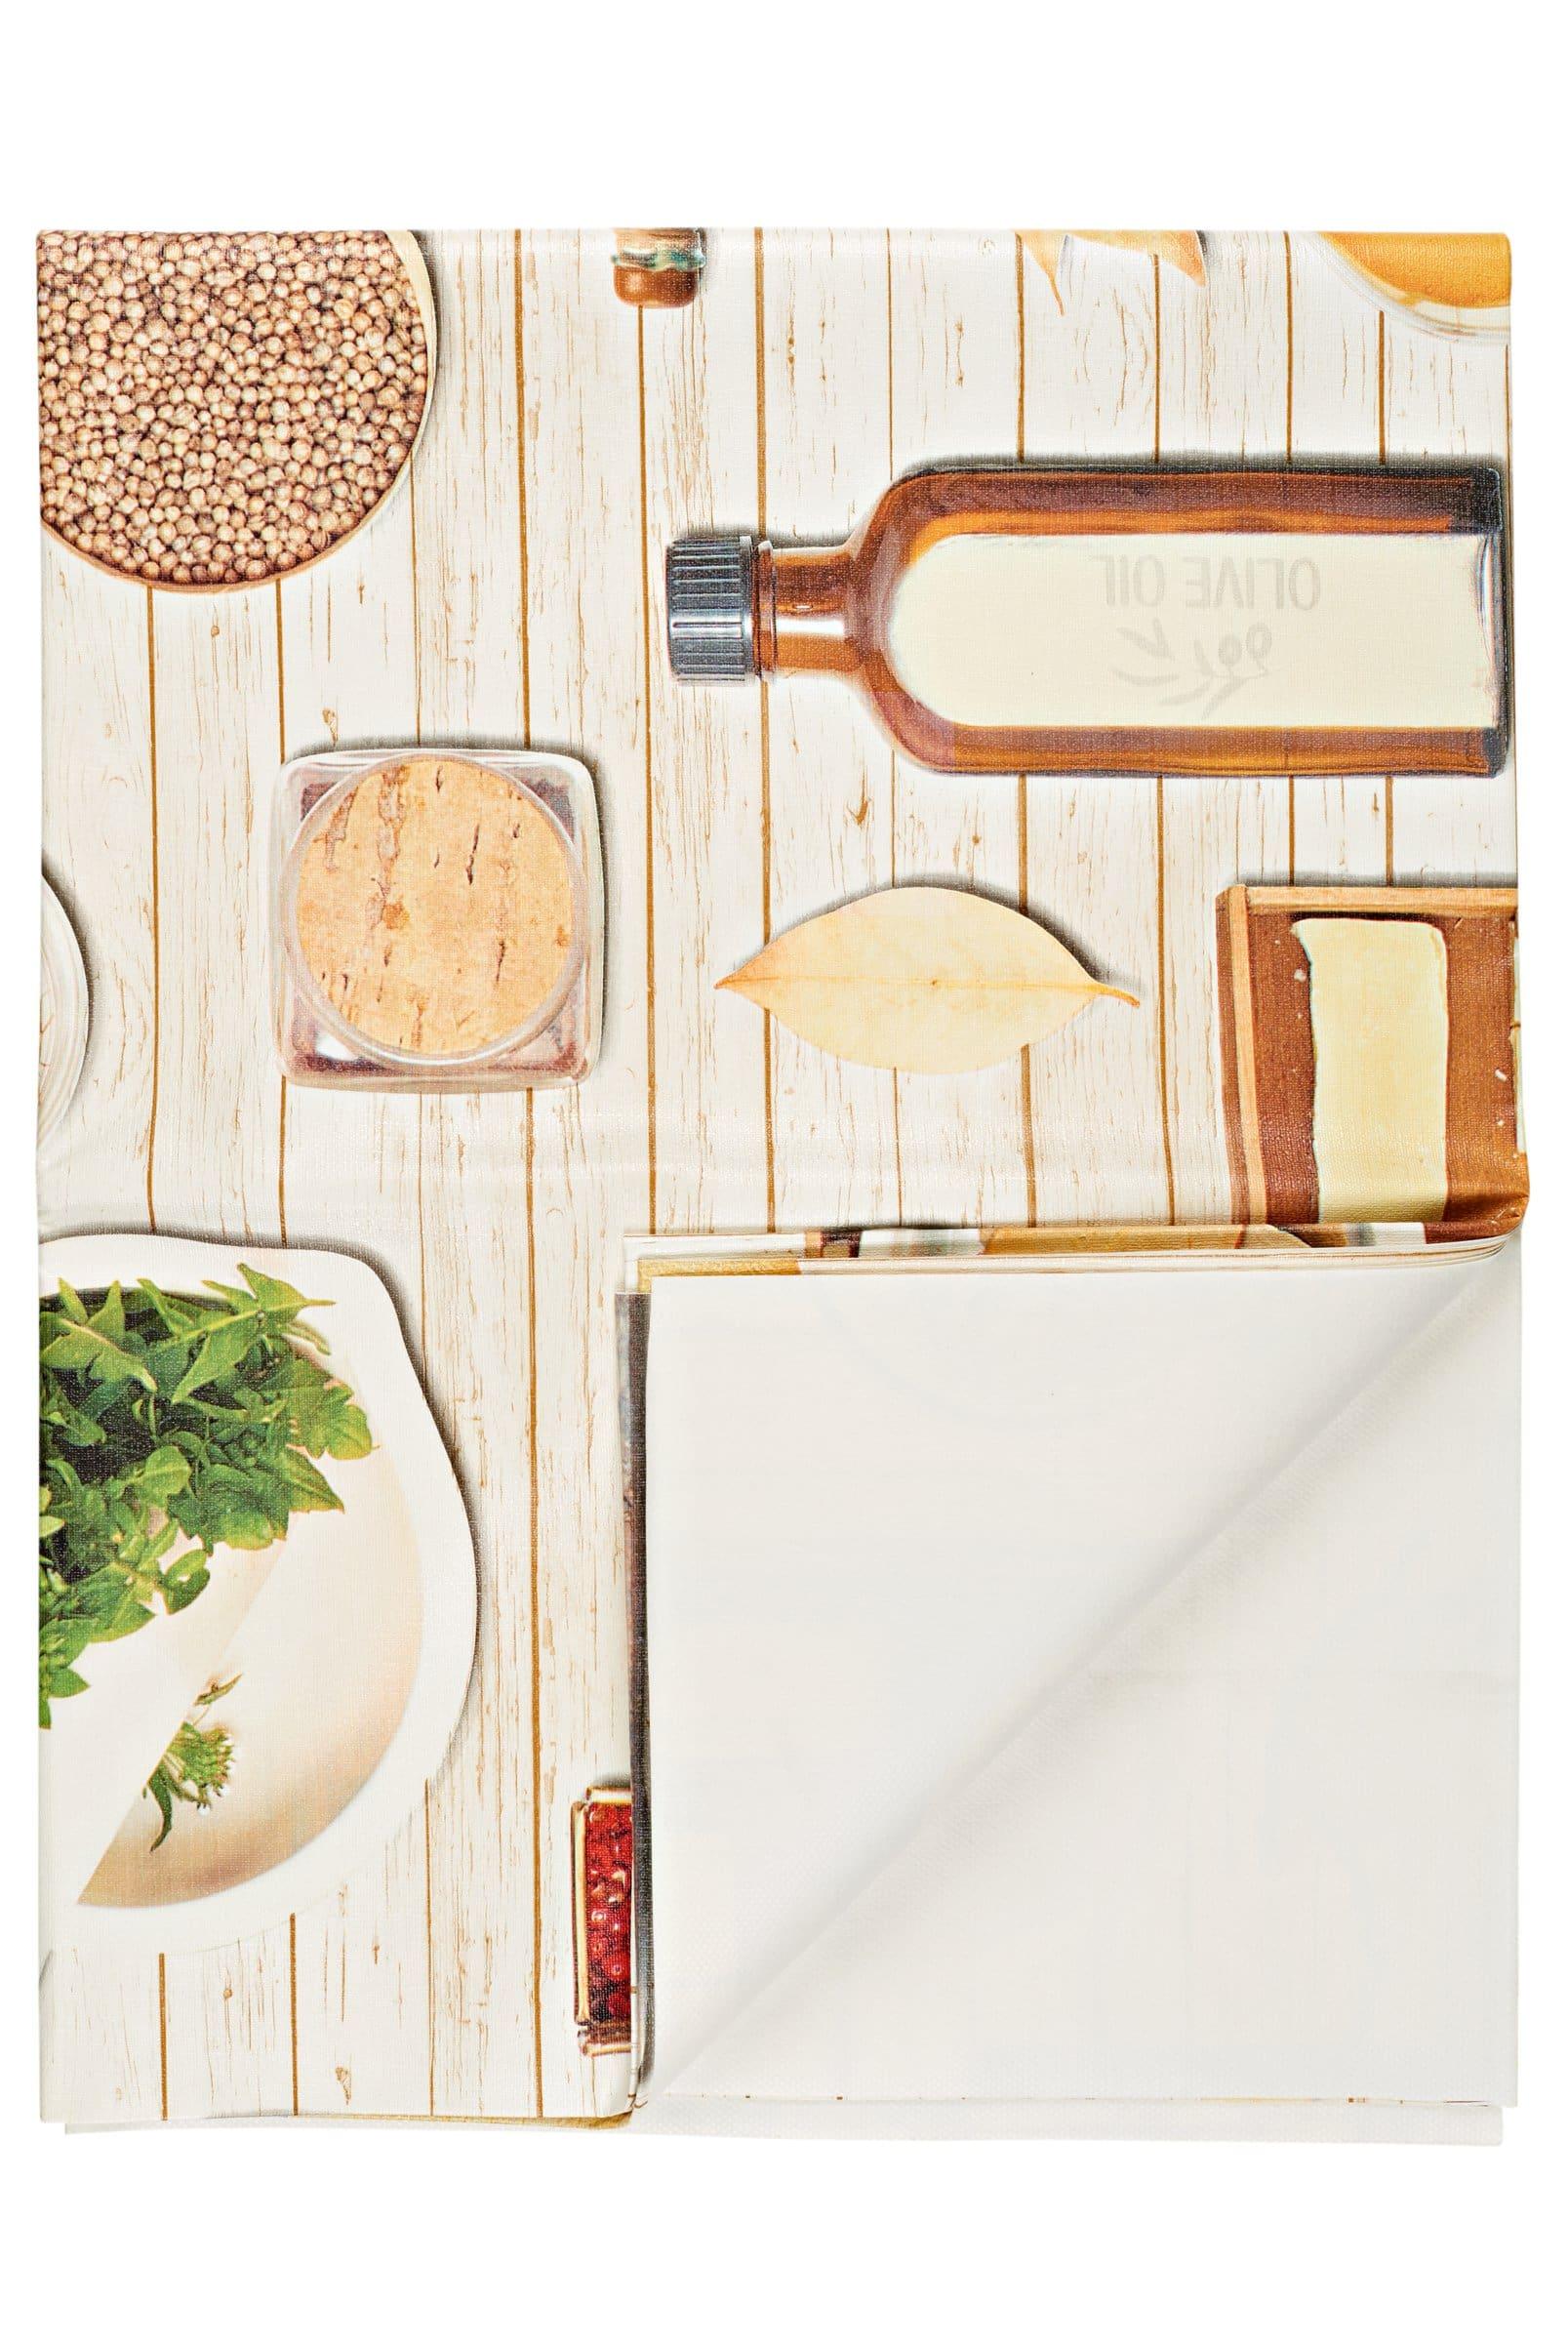 Cucina tavola cucina tavola nappe migros for Cucina tavola